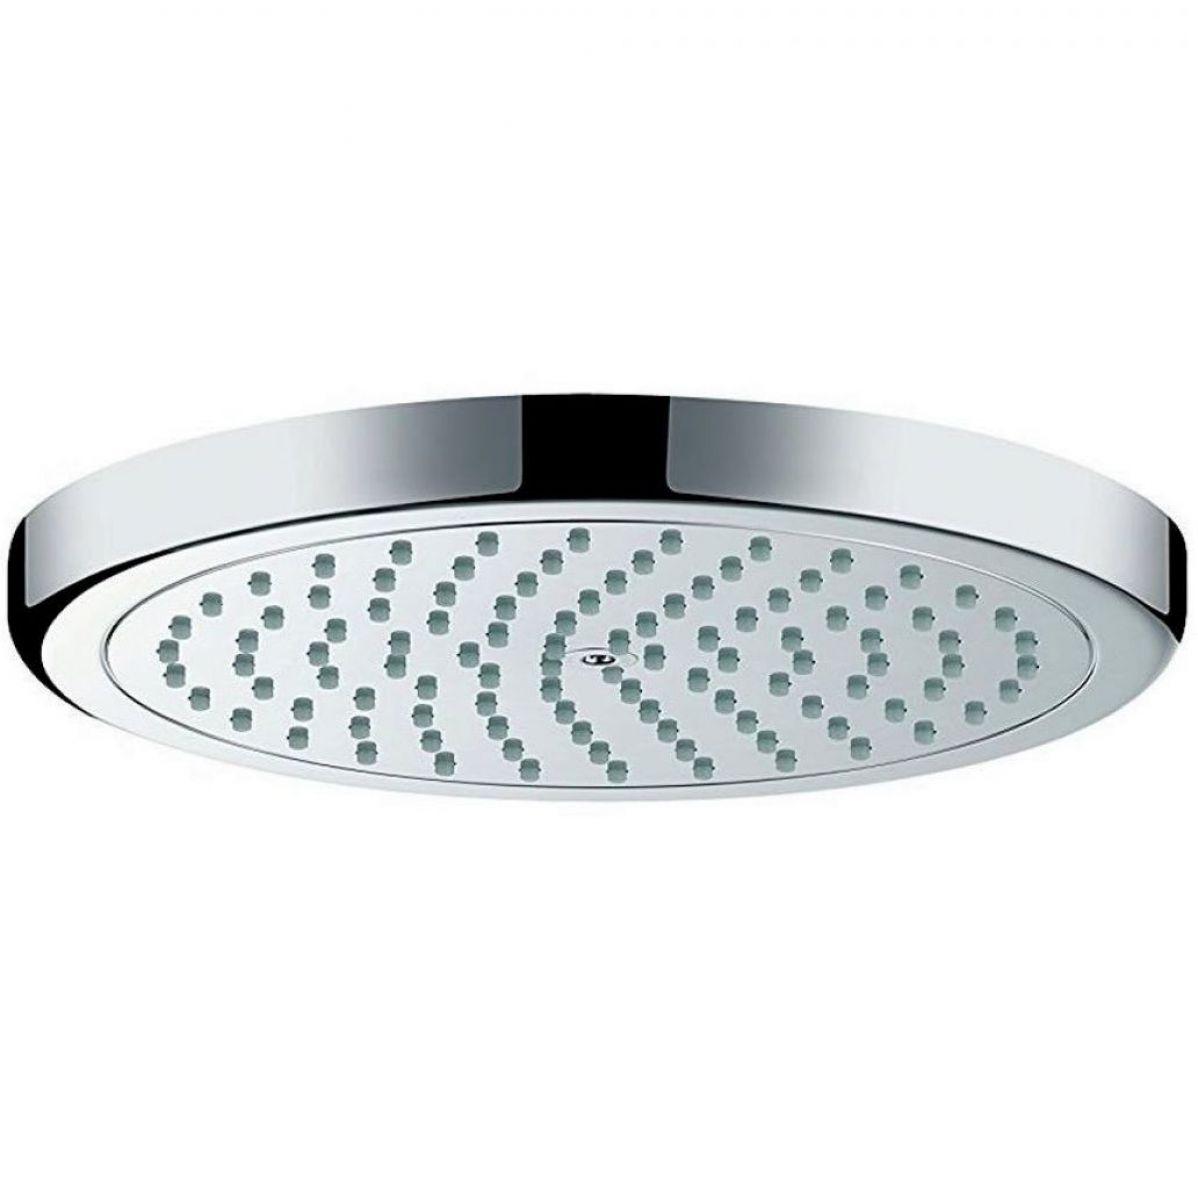 Hansgrohe Croma Overhead Shower